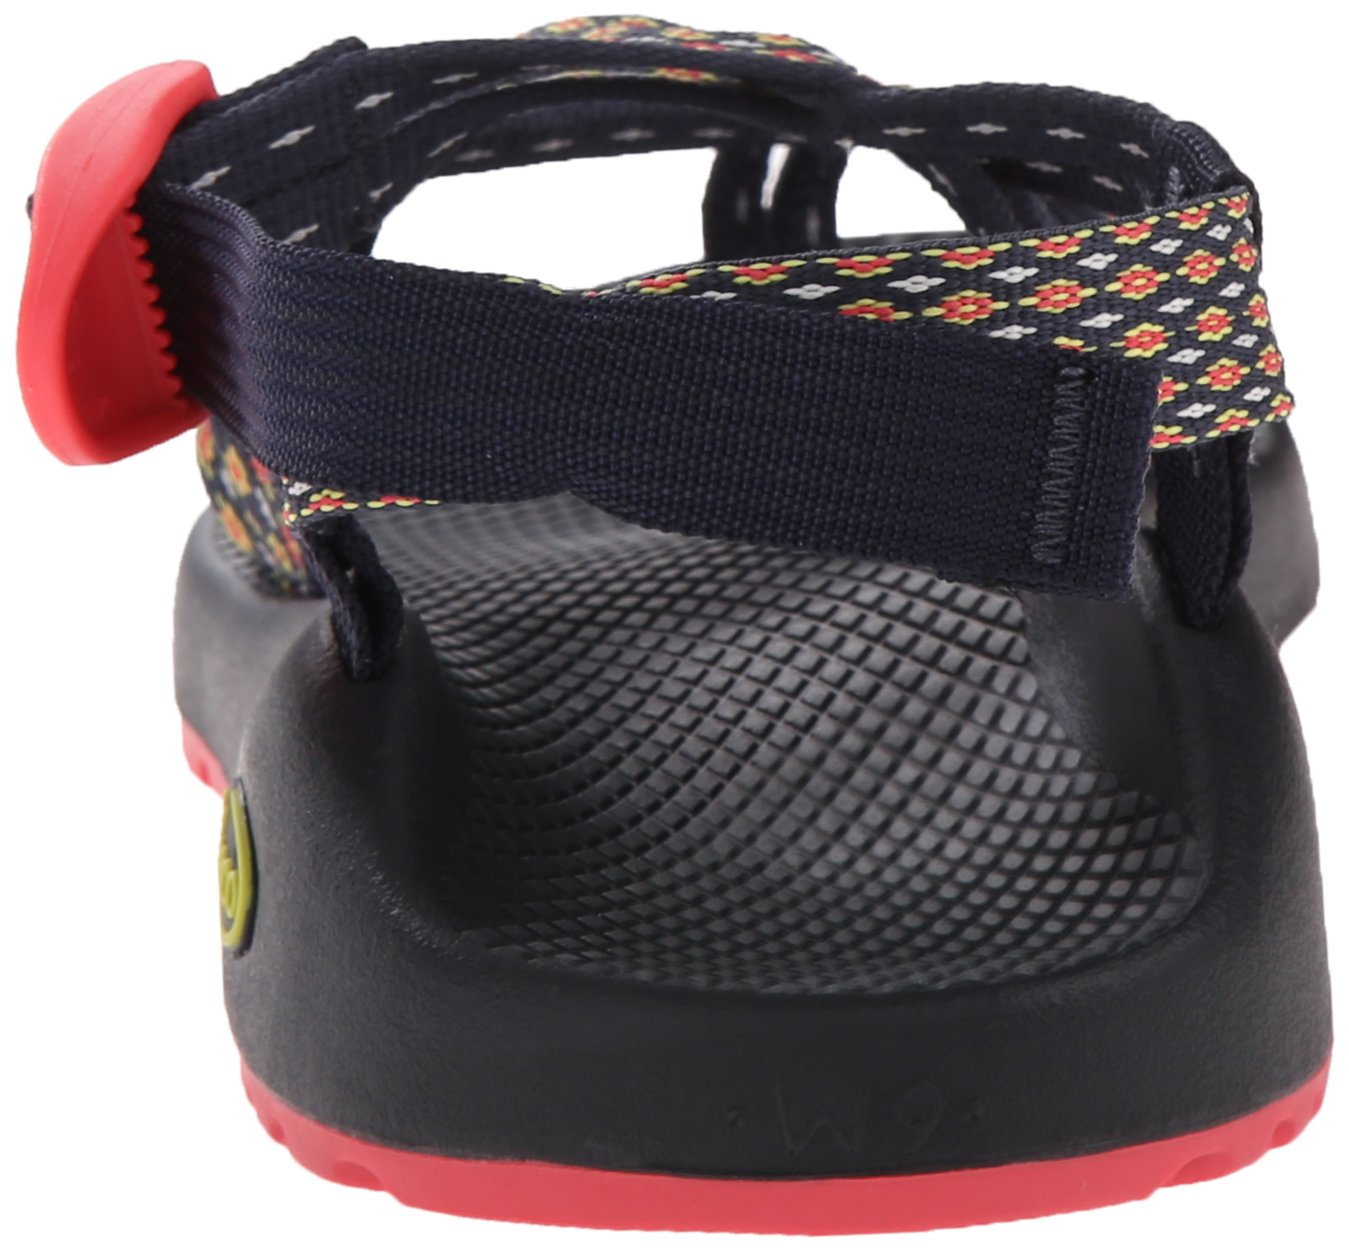 Chaco Women's ZX2 Classic Athletic Sandal B011AKPR0G 7 B(M) US|Crest Citrus